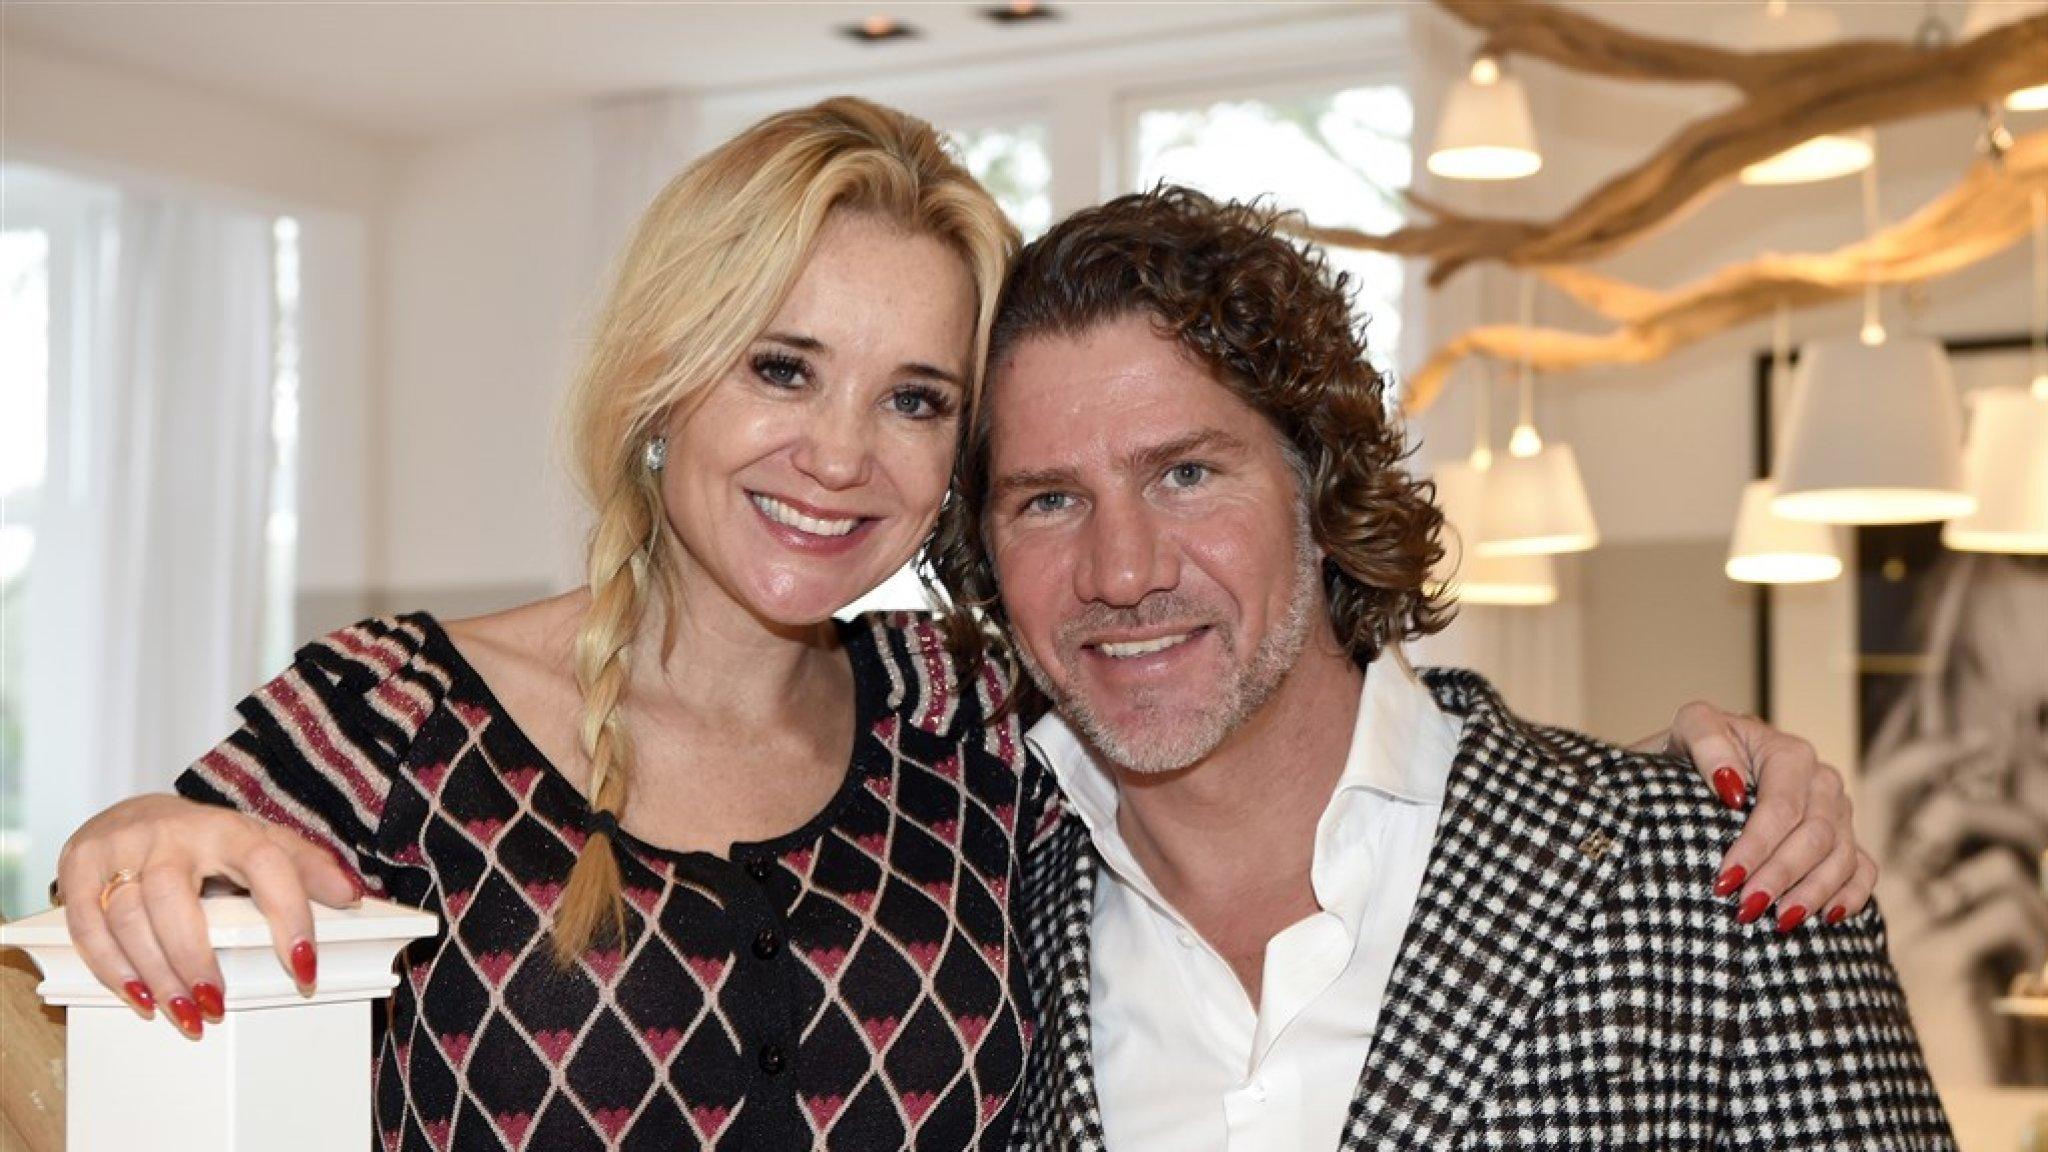 Sonja Bakker en vriend Barry ontvluchten samen Nederland - RTL Nieuws